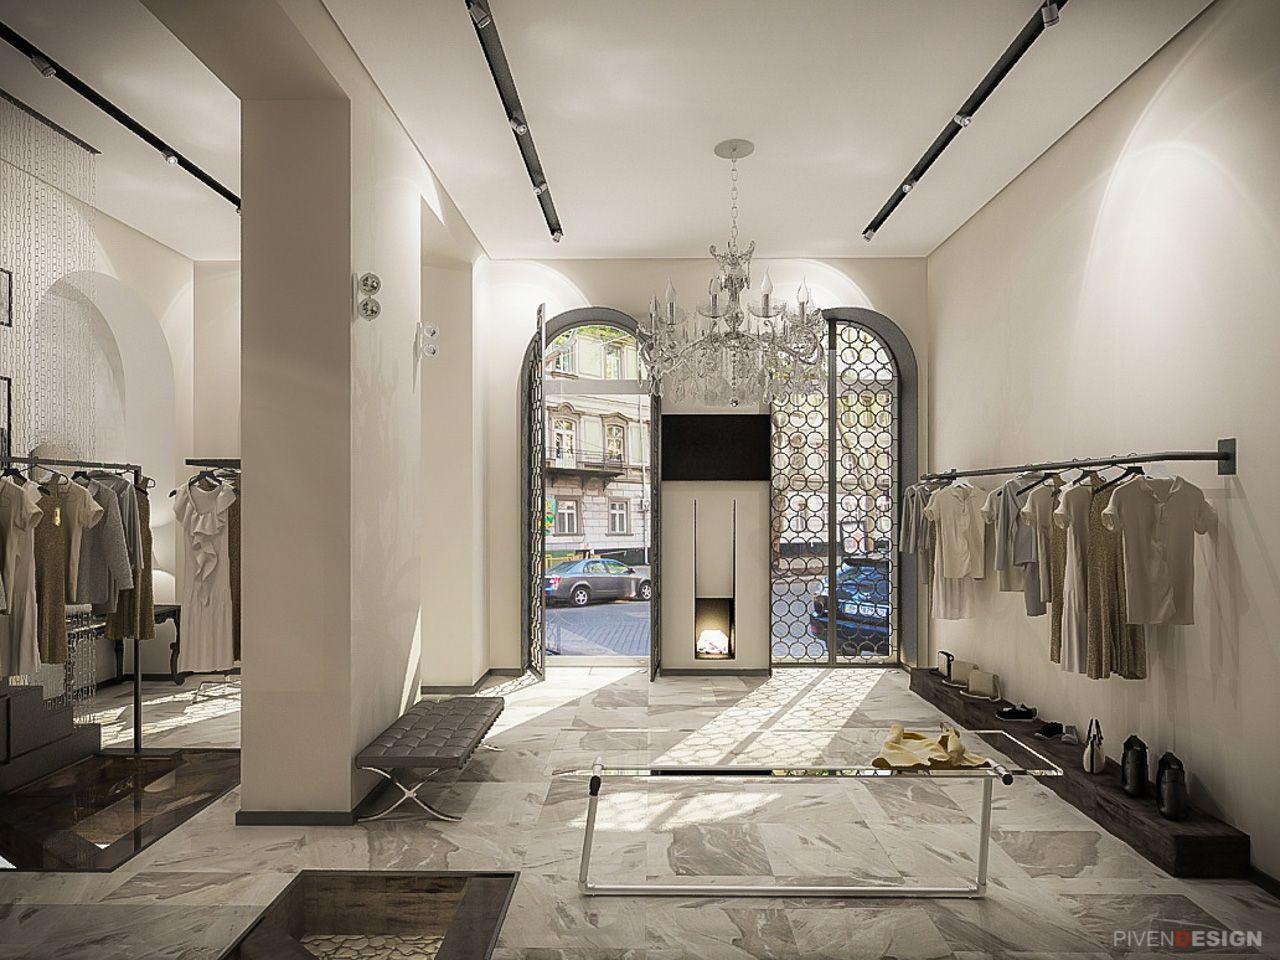 e77953d10a8 Дизайн интерьера бутика-ателье в одессе  boutiquedesign  shopinterior